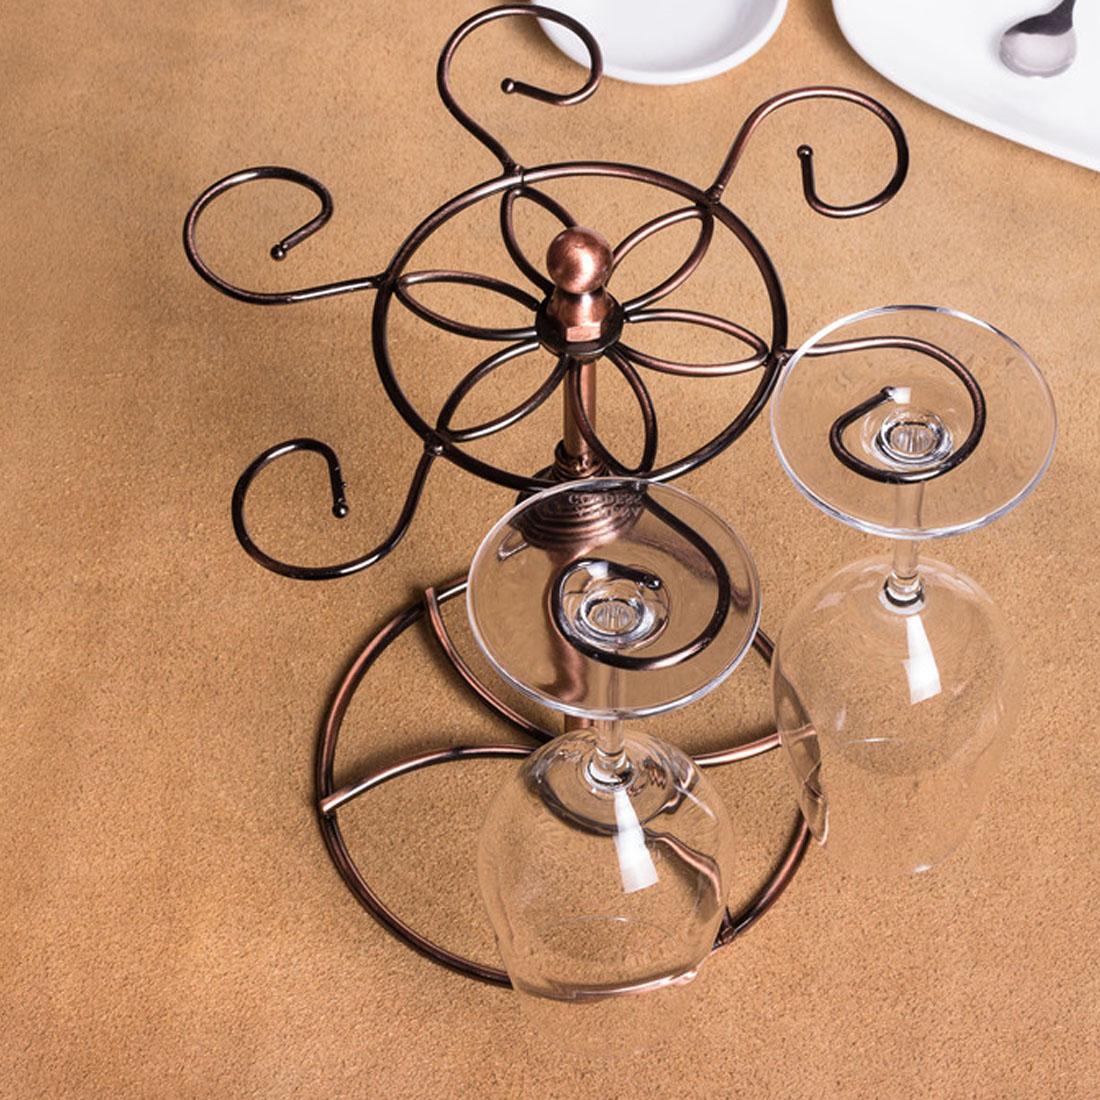 Metal Elegant Tabletop 6 Wine Glass Drying Rack Holder Display Bronze Tone 5